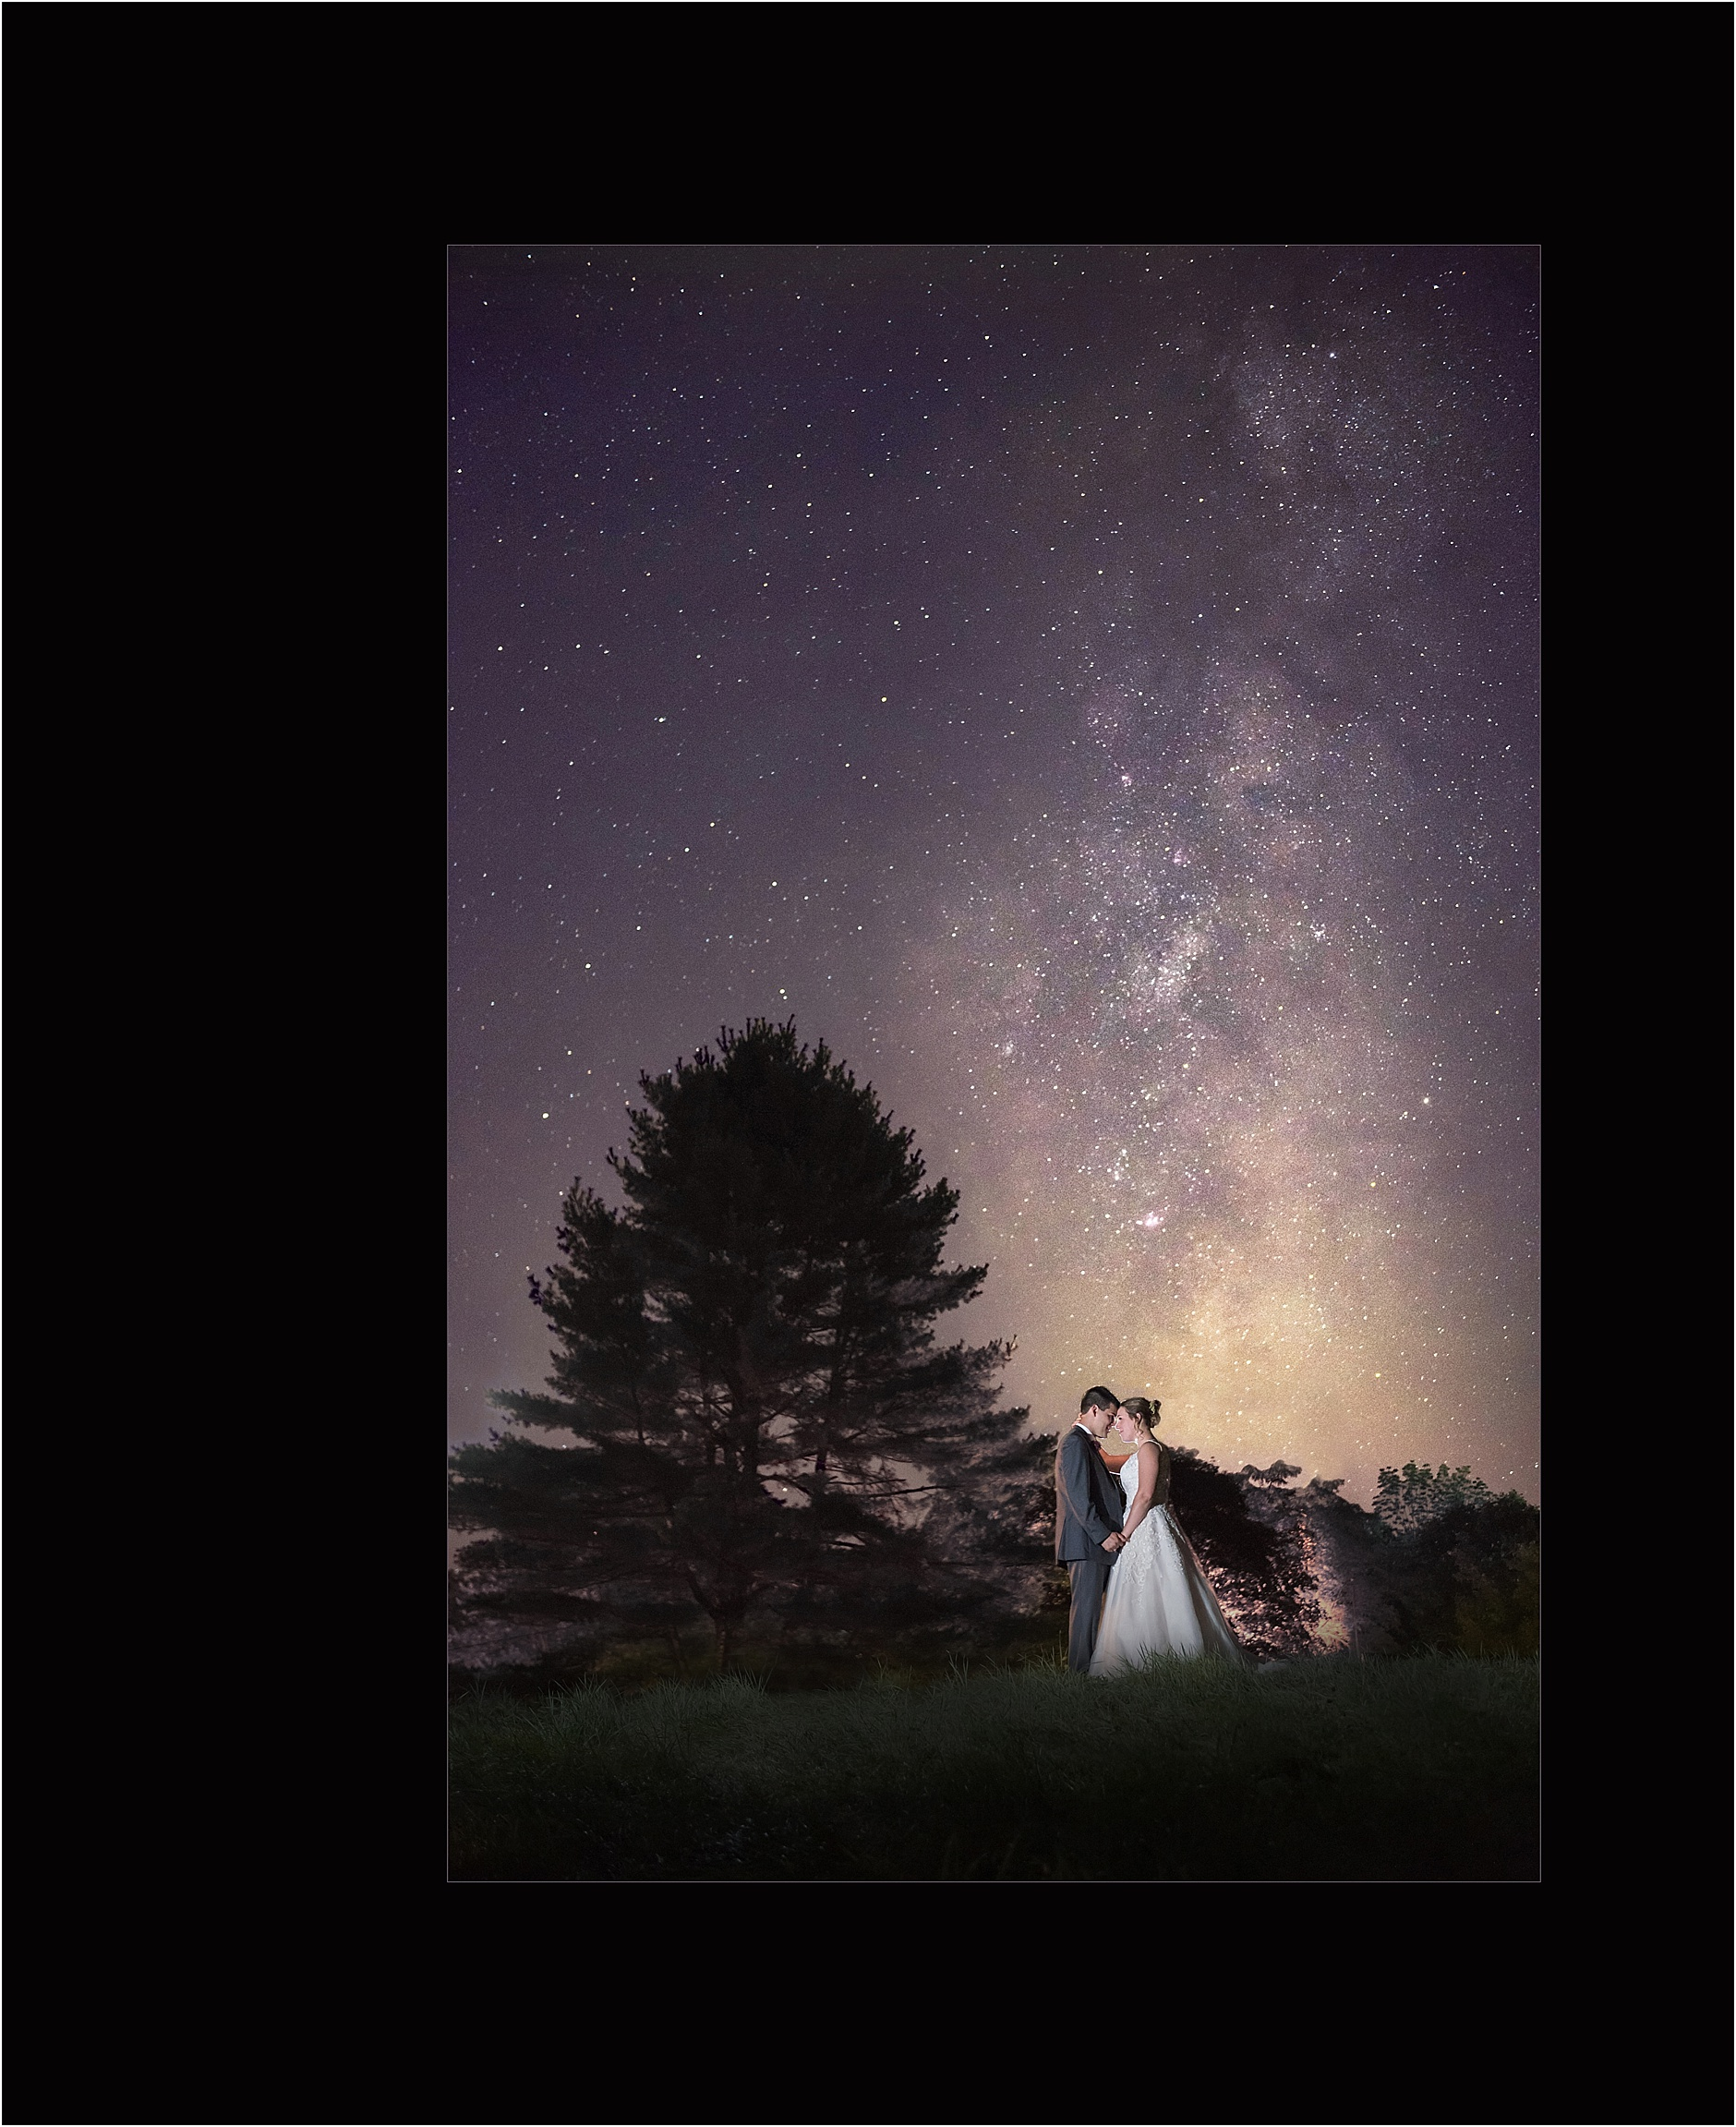 Award Winning Photographers, Maine Wedding Photography - Under the Light of a Thousand Stars